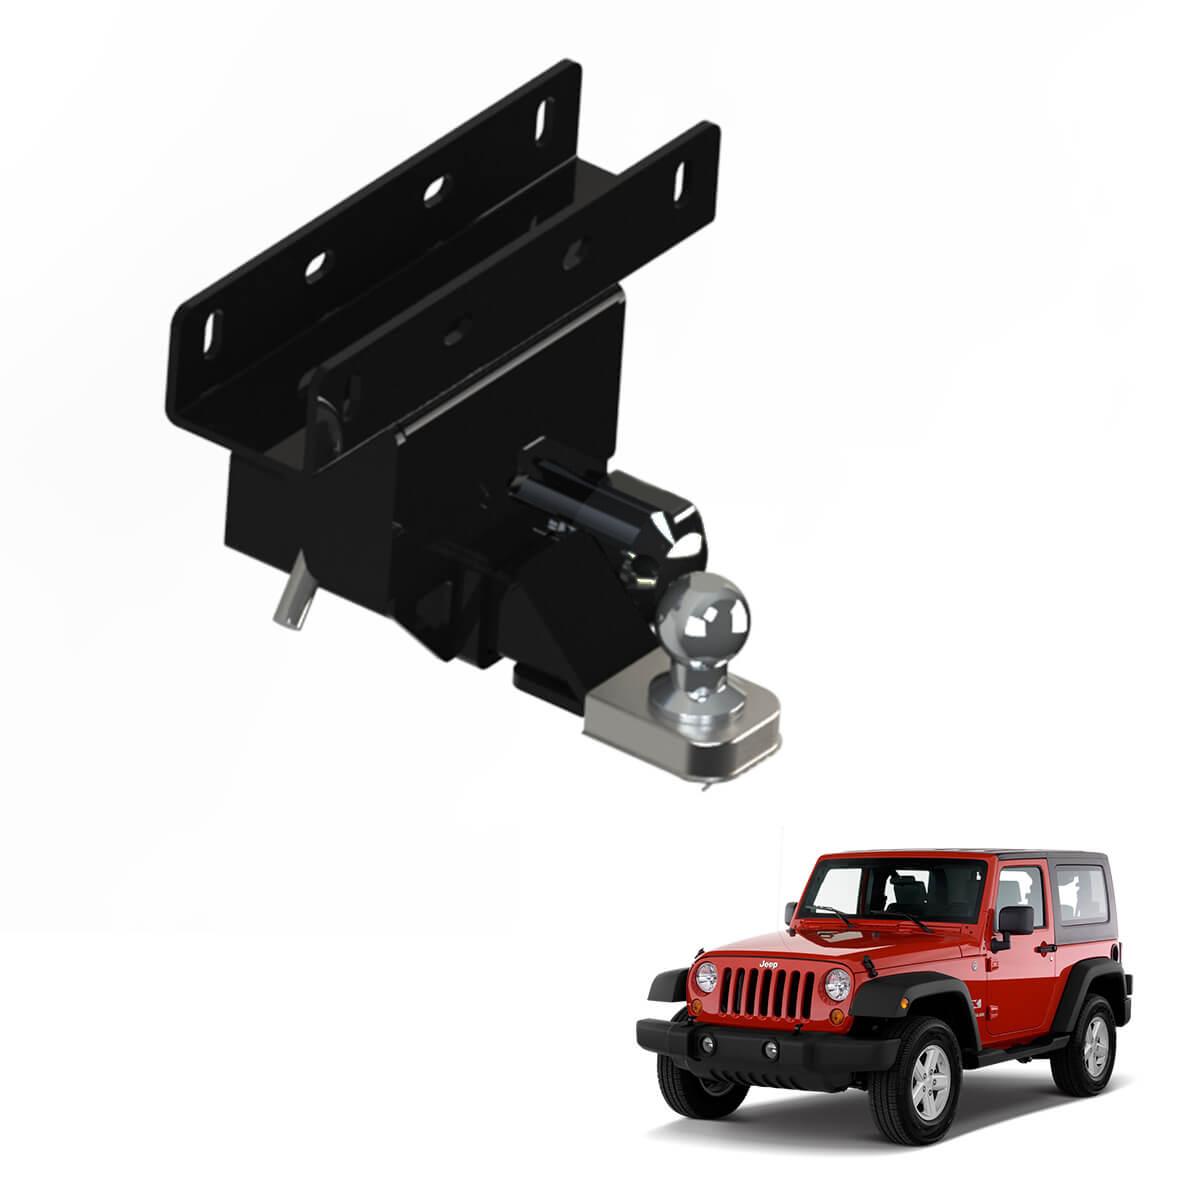 Engate de reboque removível Gedeval Jeep Wrangler 2007 a 2020